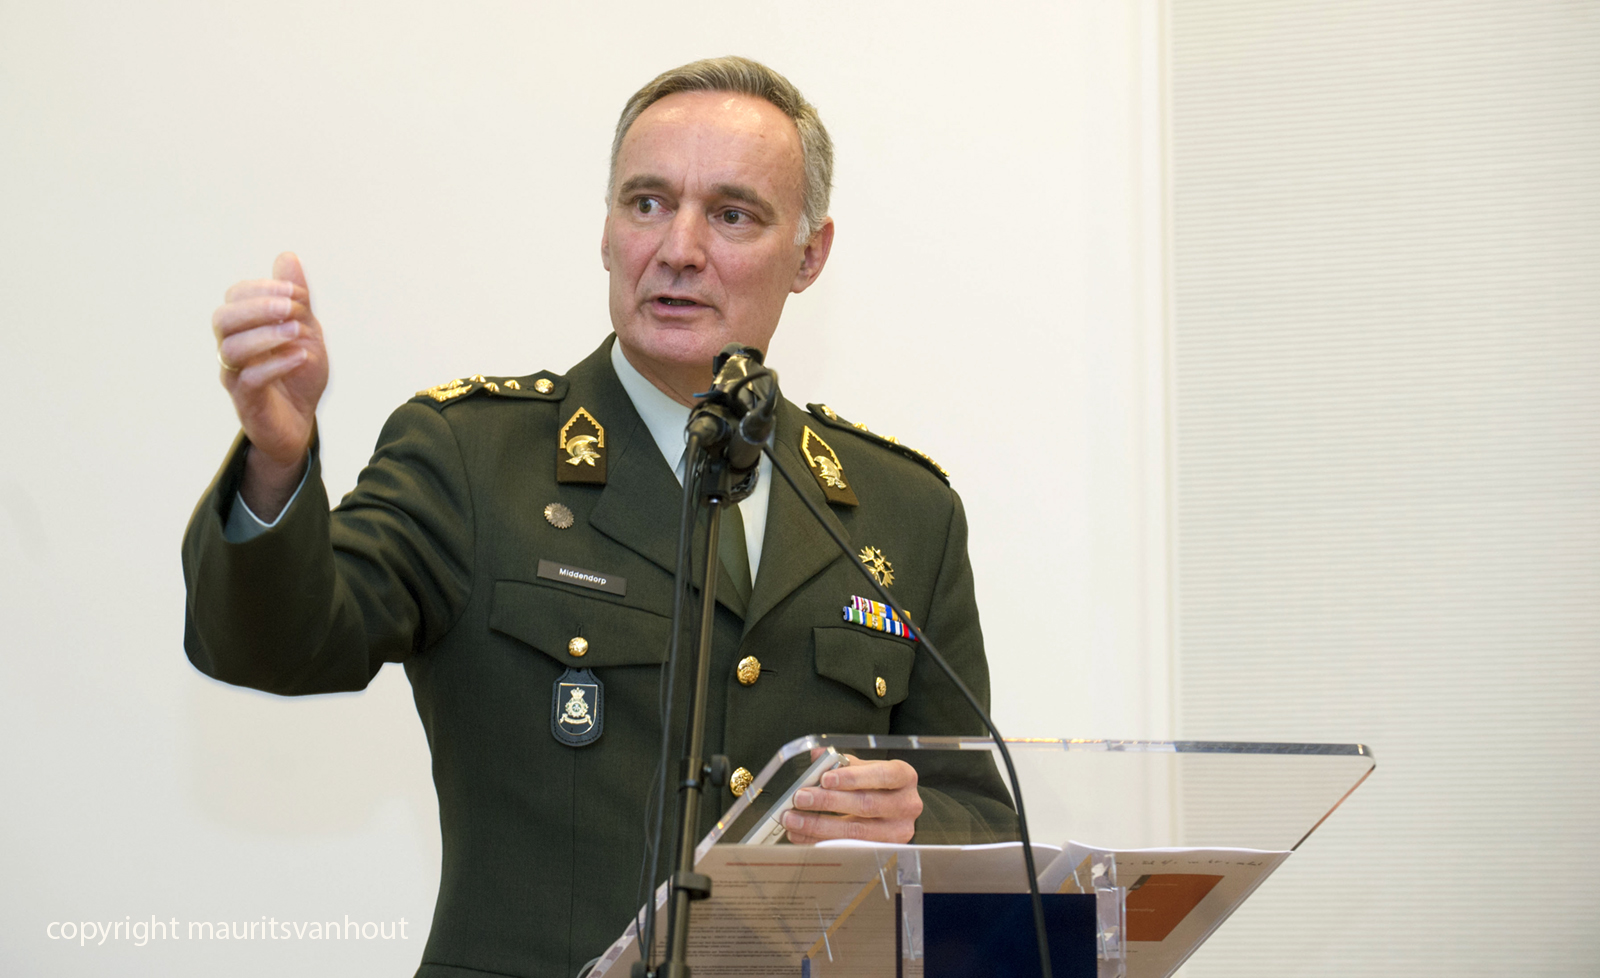 portret commandant der Strijdkrachten